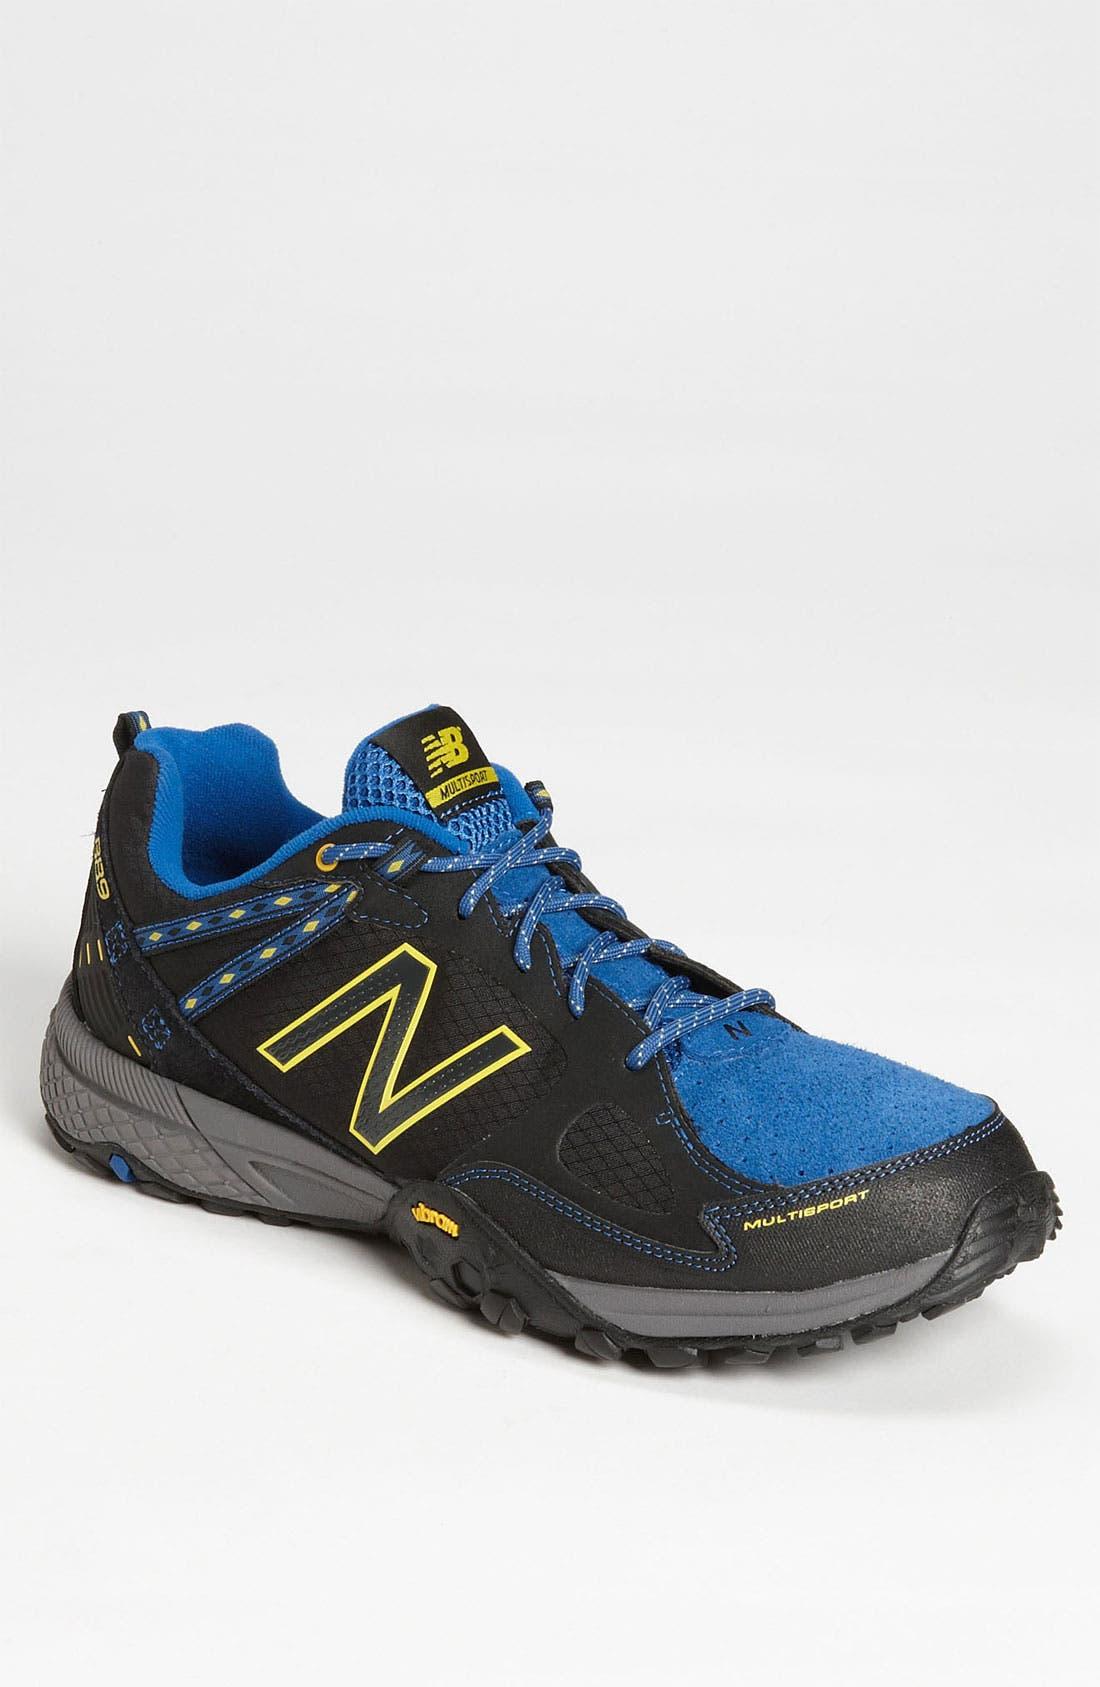 Main Image - New Balance '889' Trail Running Shoe (Men)